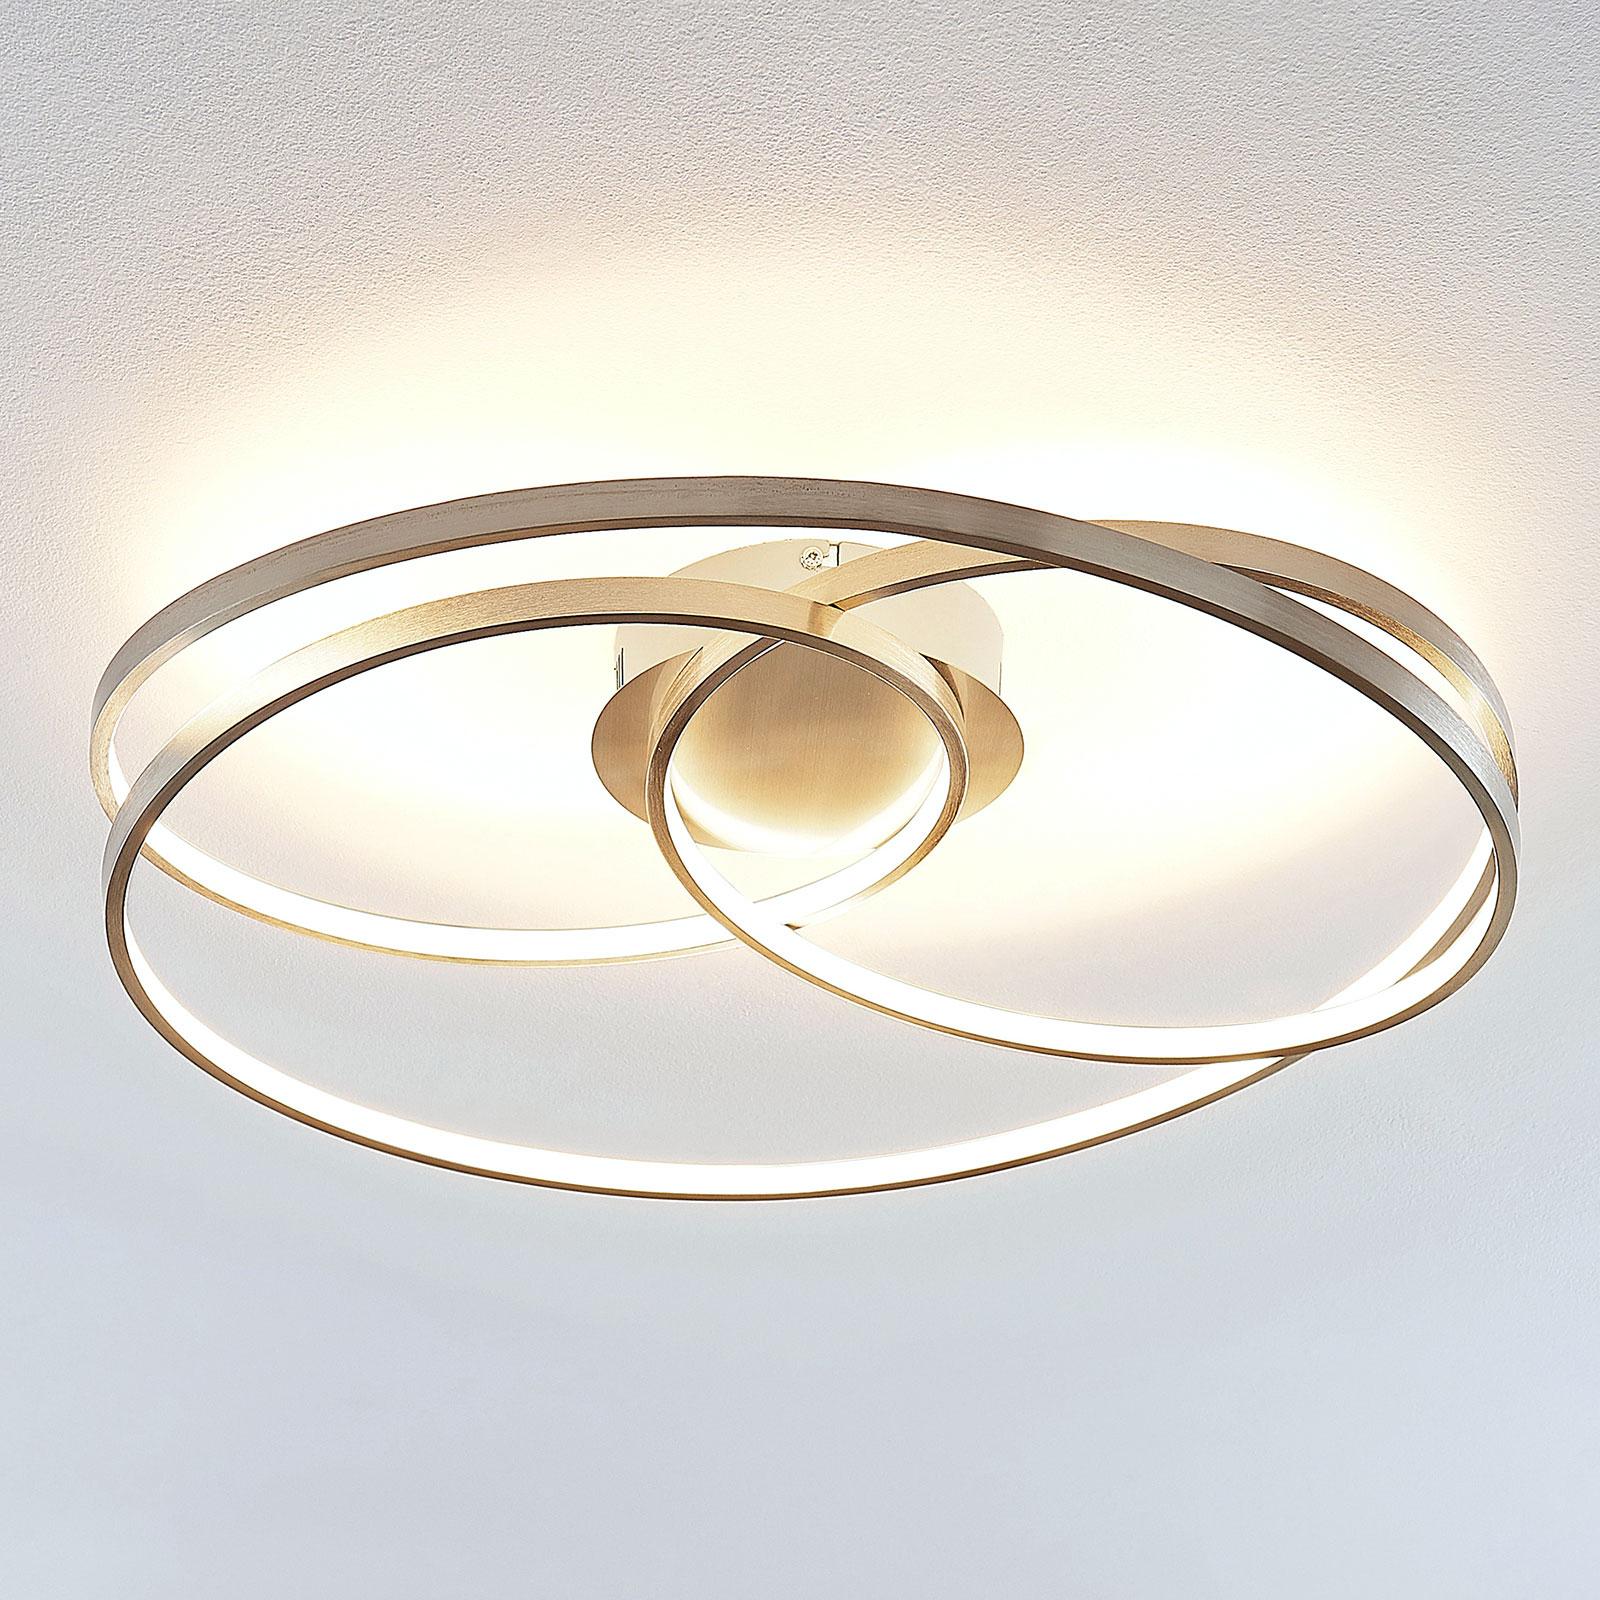 Lindby Ronka LED-kattovalaisin, satinoitu nikkeli